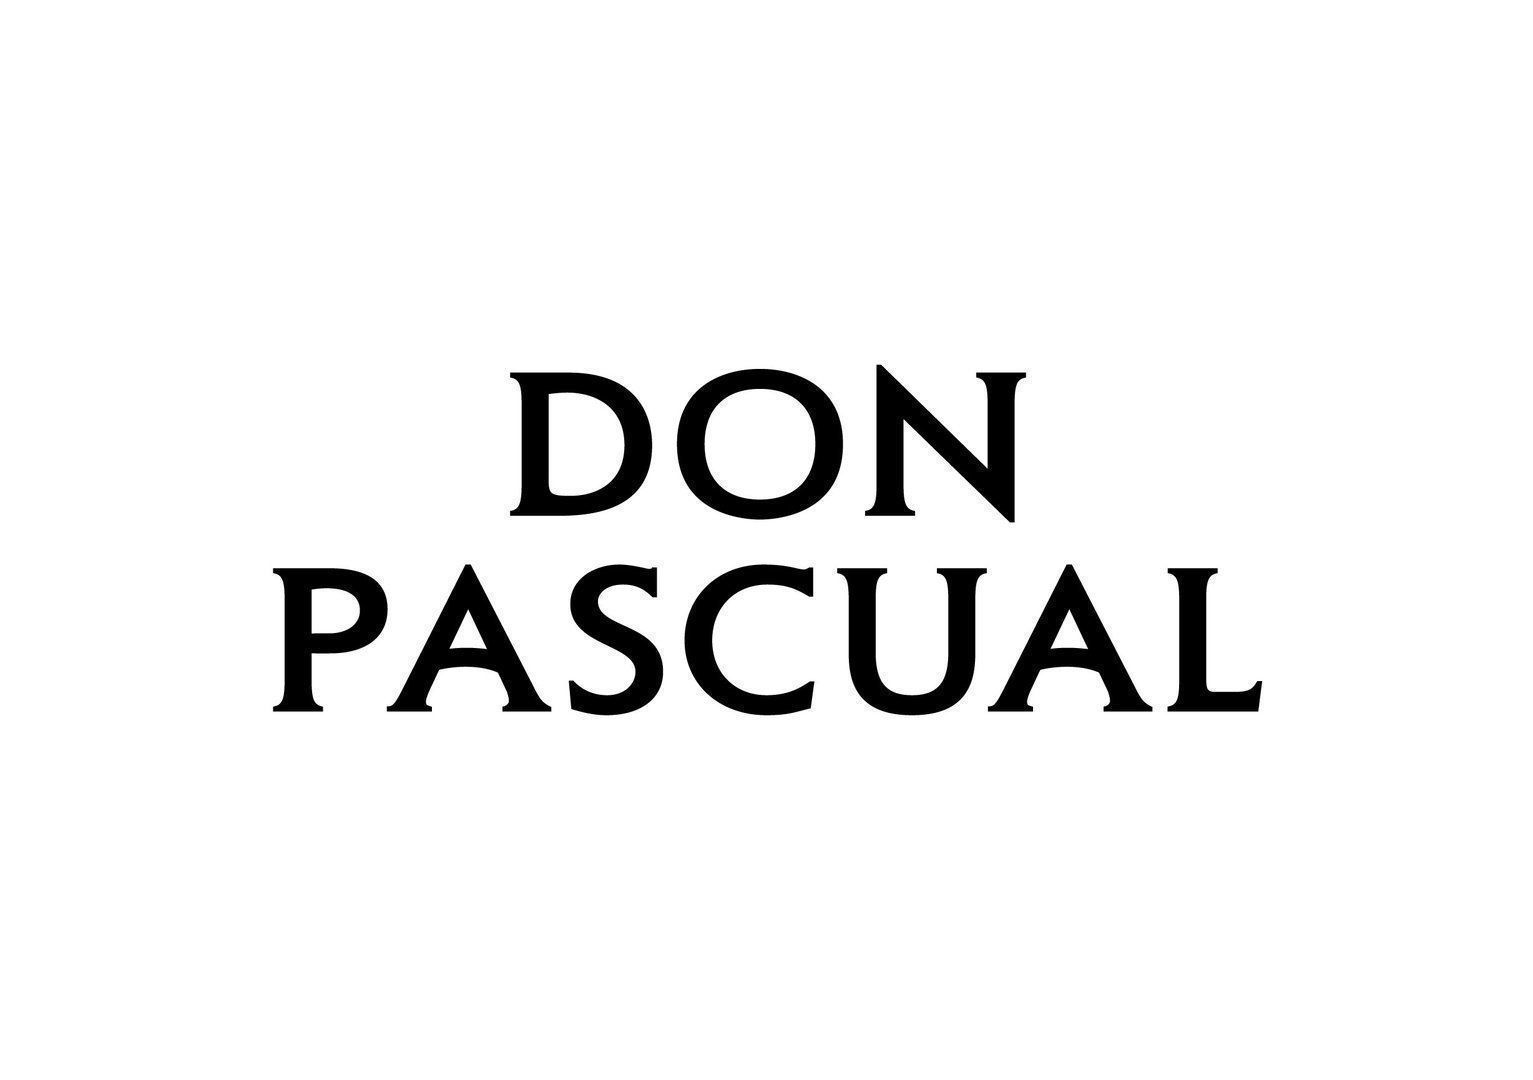 logoDONPASCUAL2012